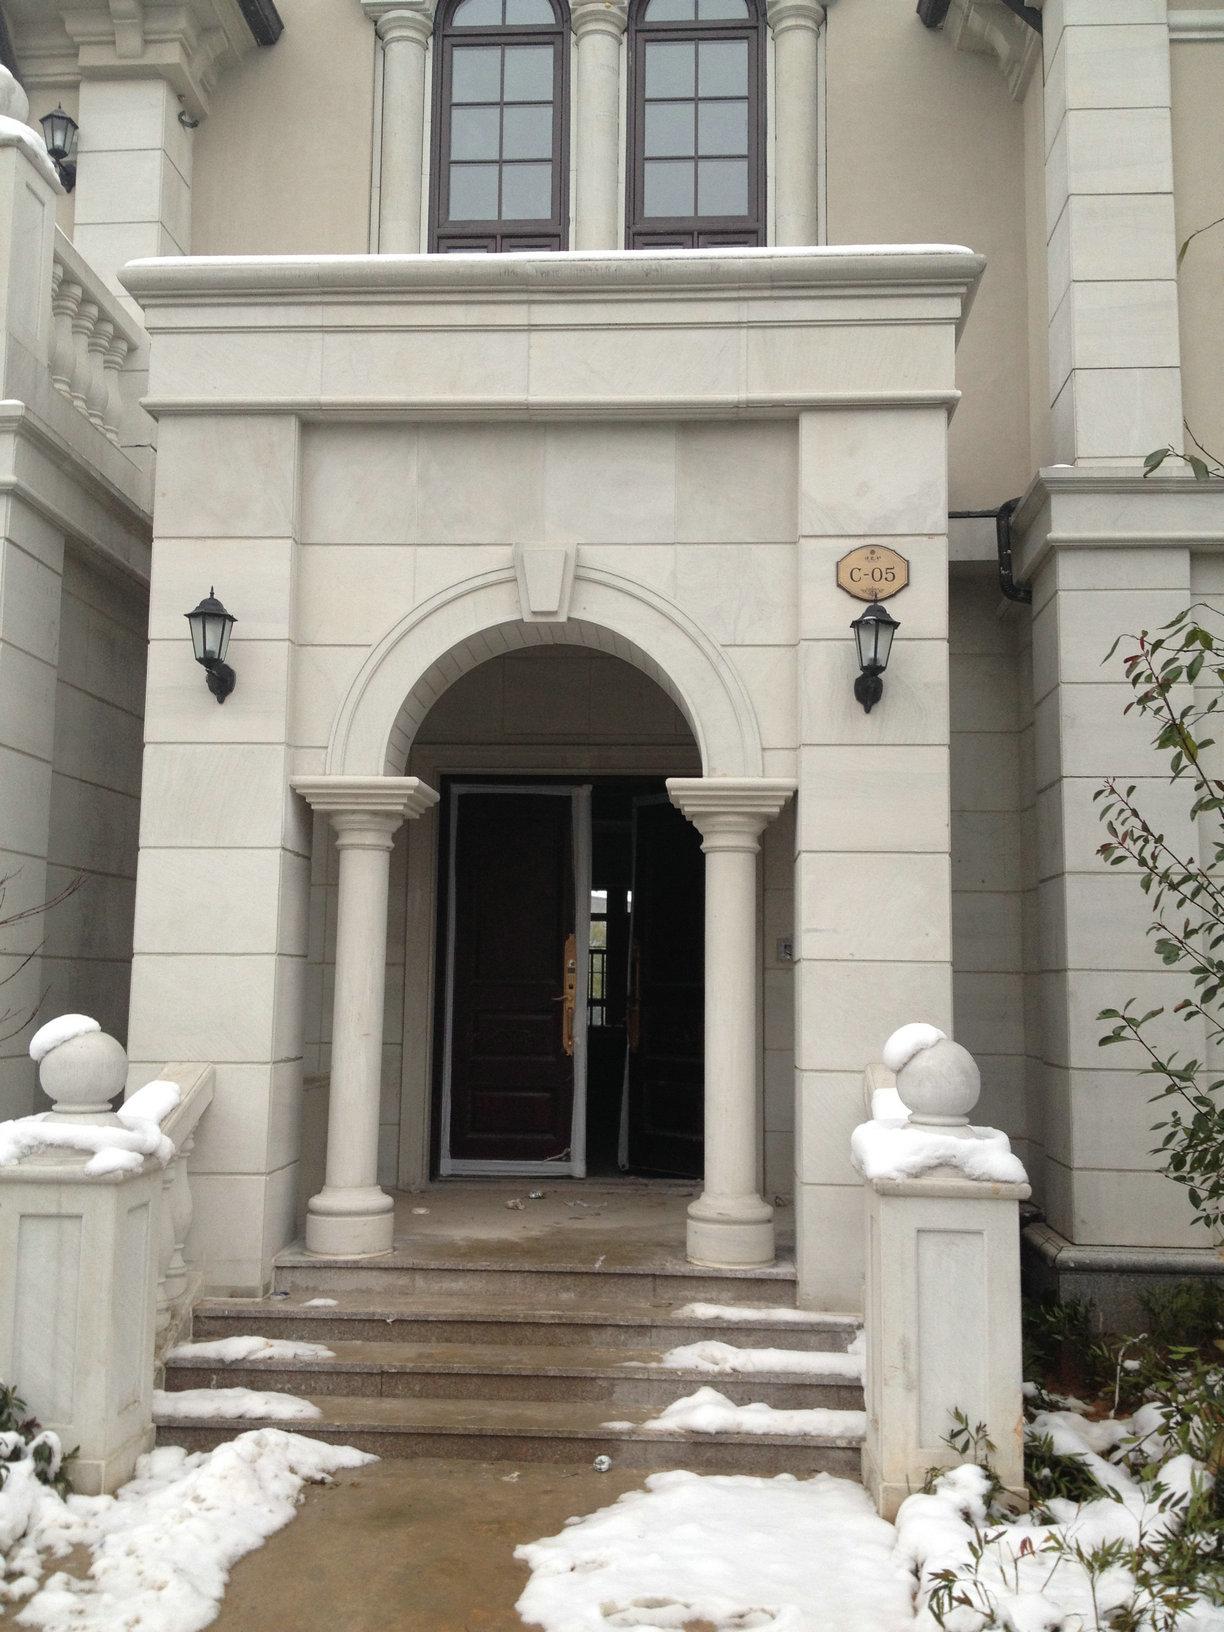 White sandstone lintel